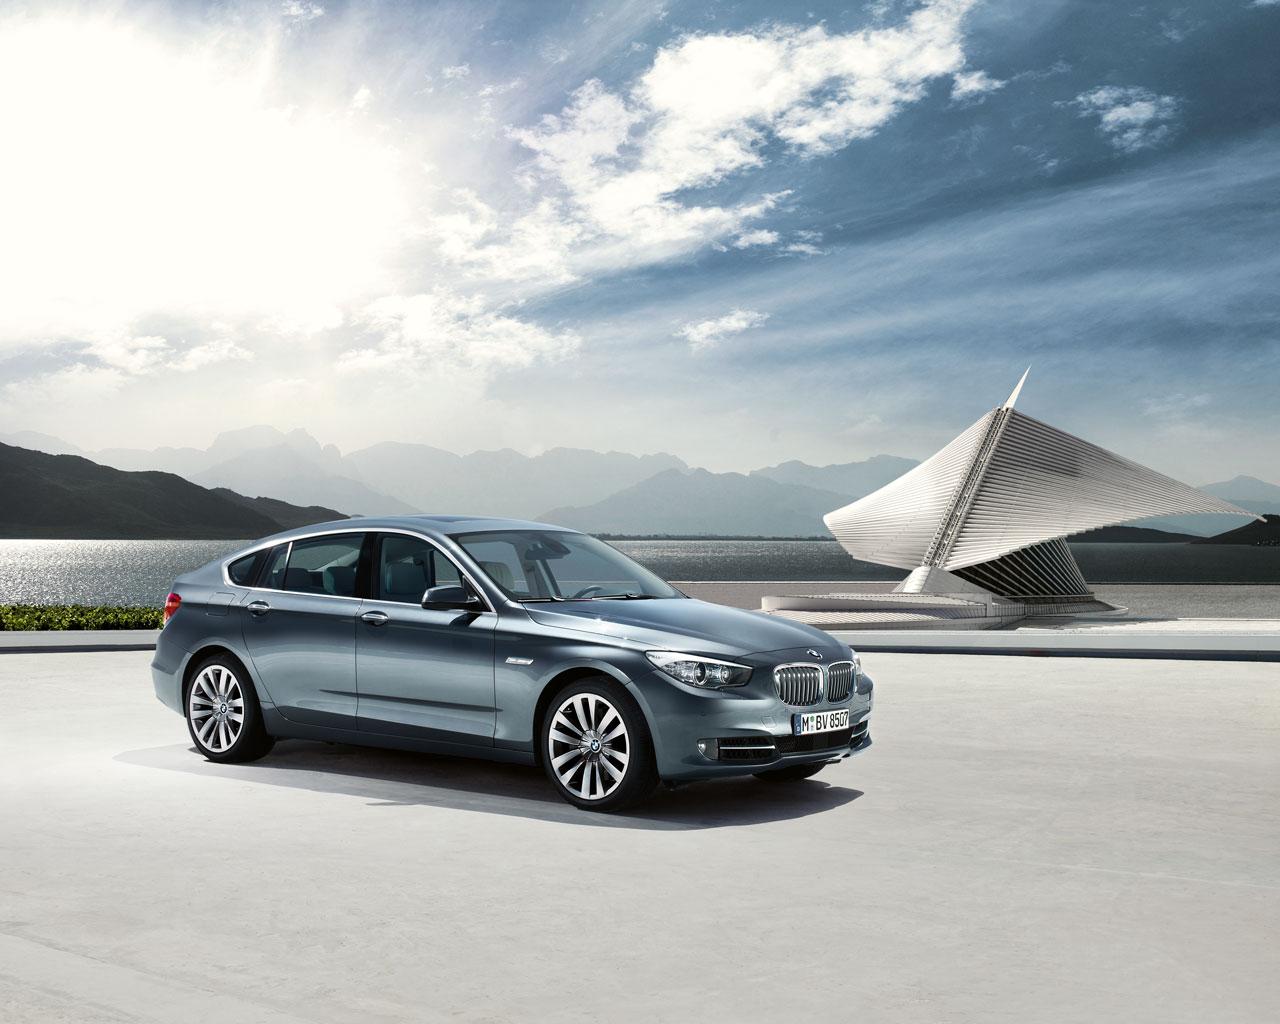 New Video: BMW 5 Series Gran Turismo